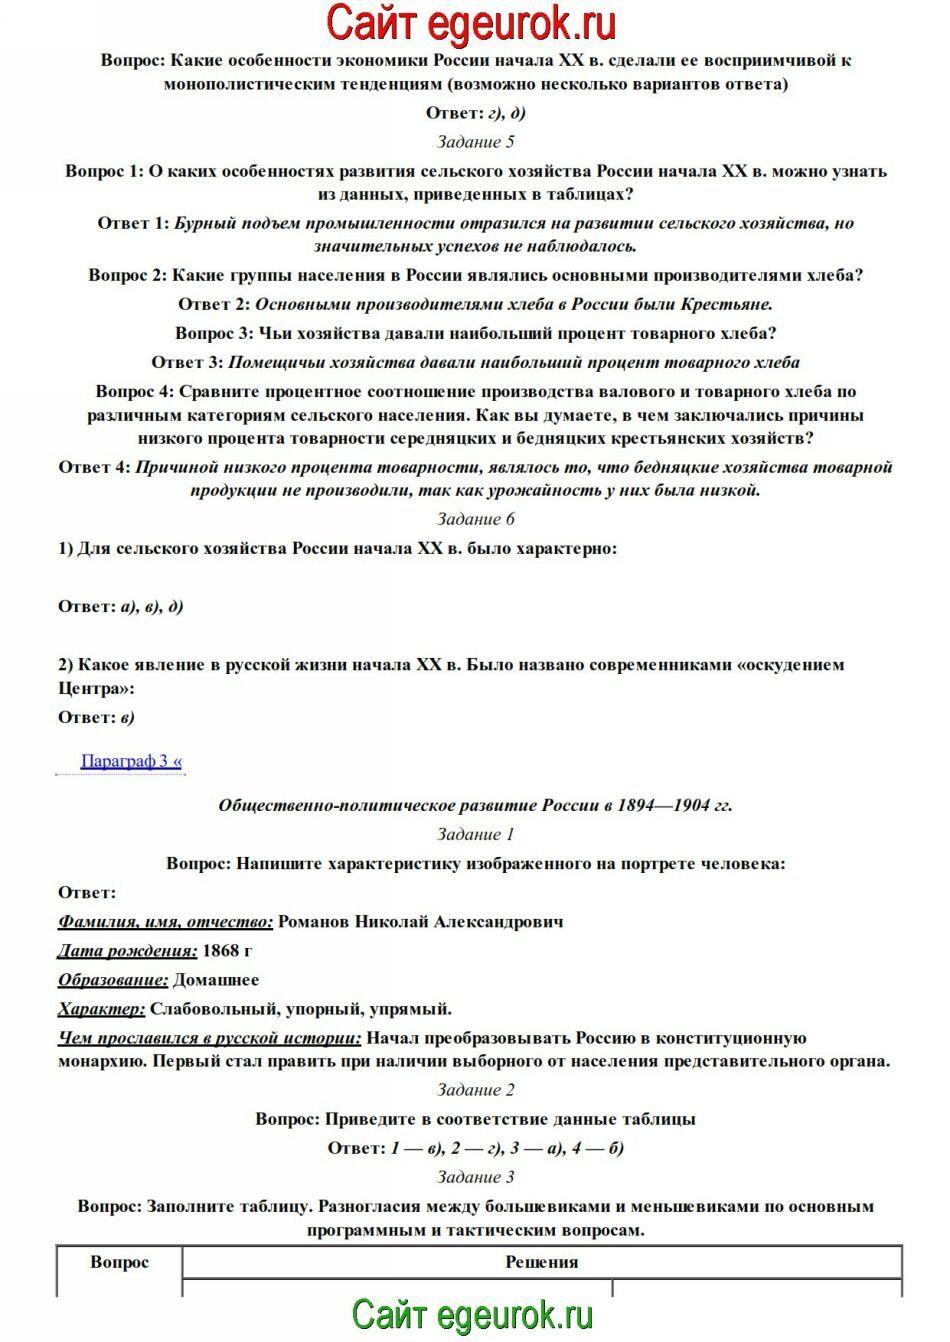 Gdz Po Matematike 5 Klass Vilenkin Nomer Blog